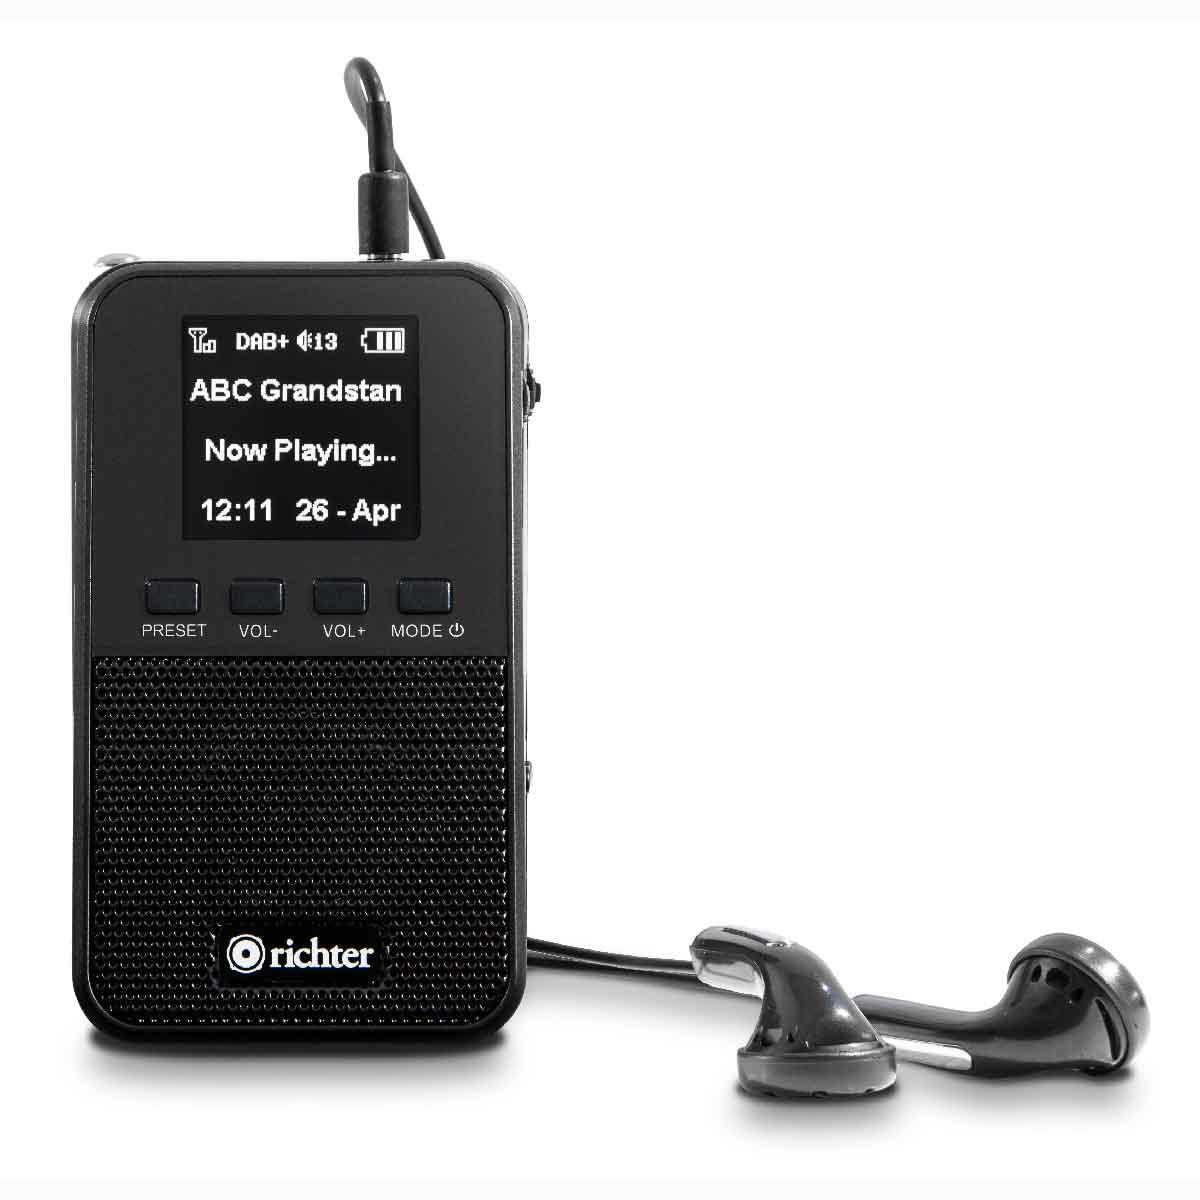 RR10 Richter Portable Pocket DAB+ Digital with Headphones